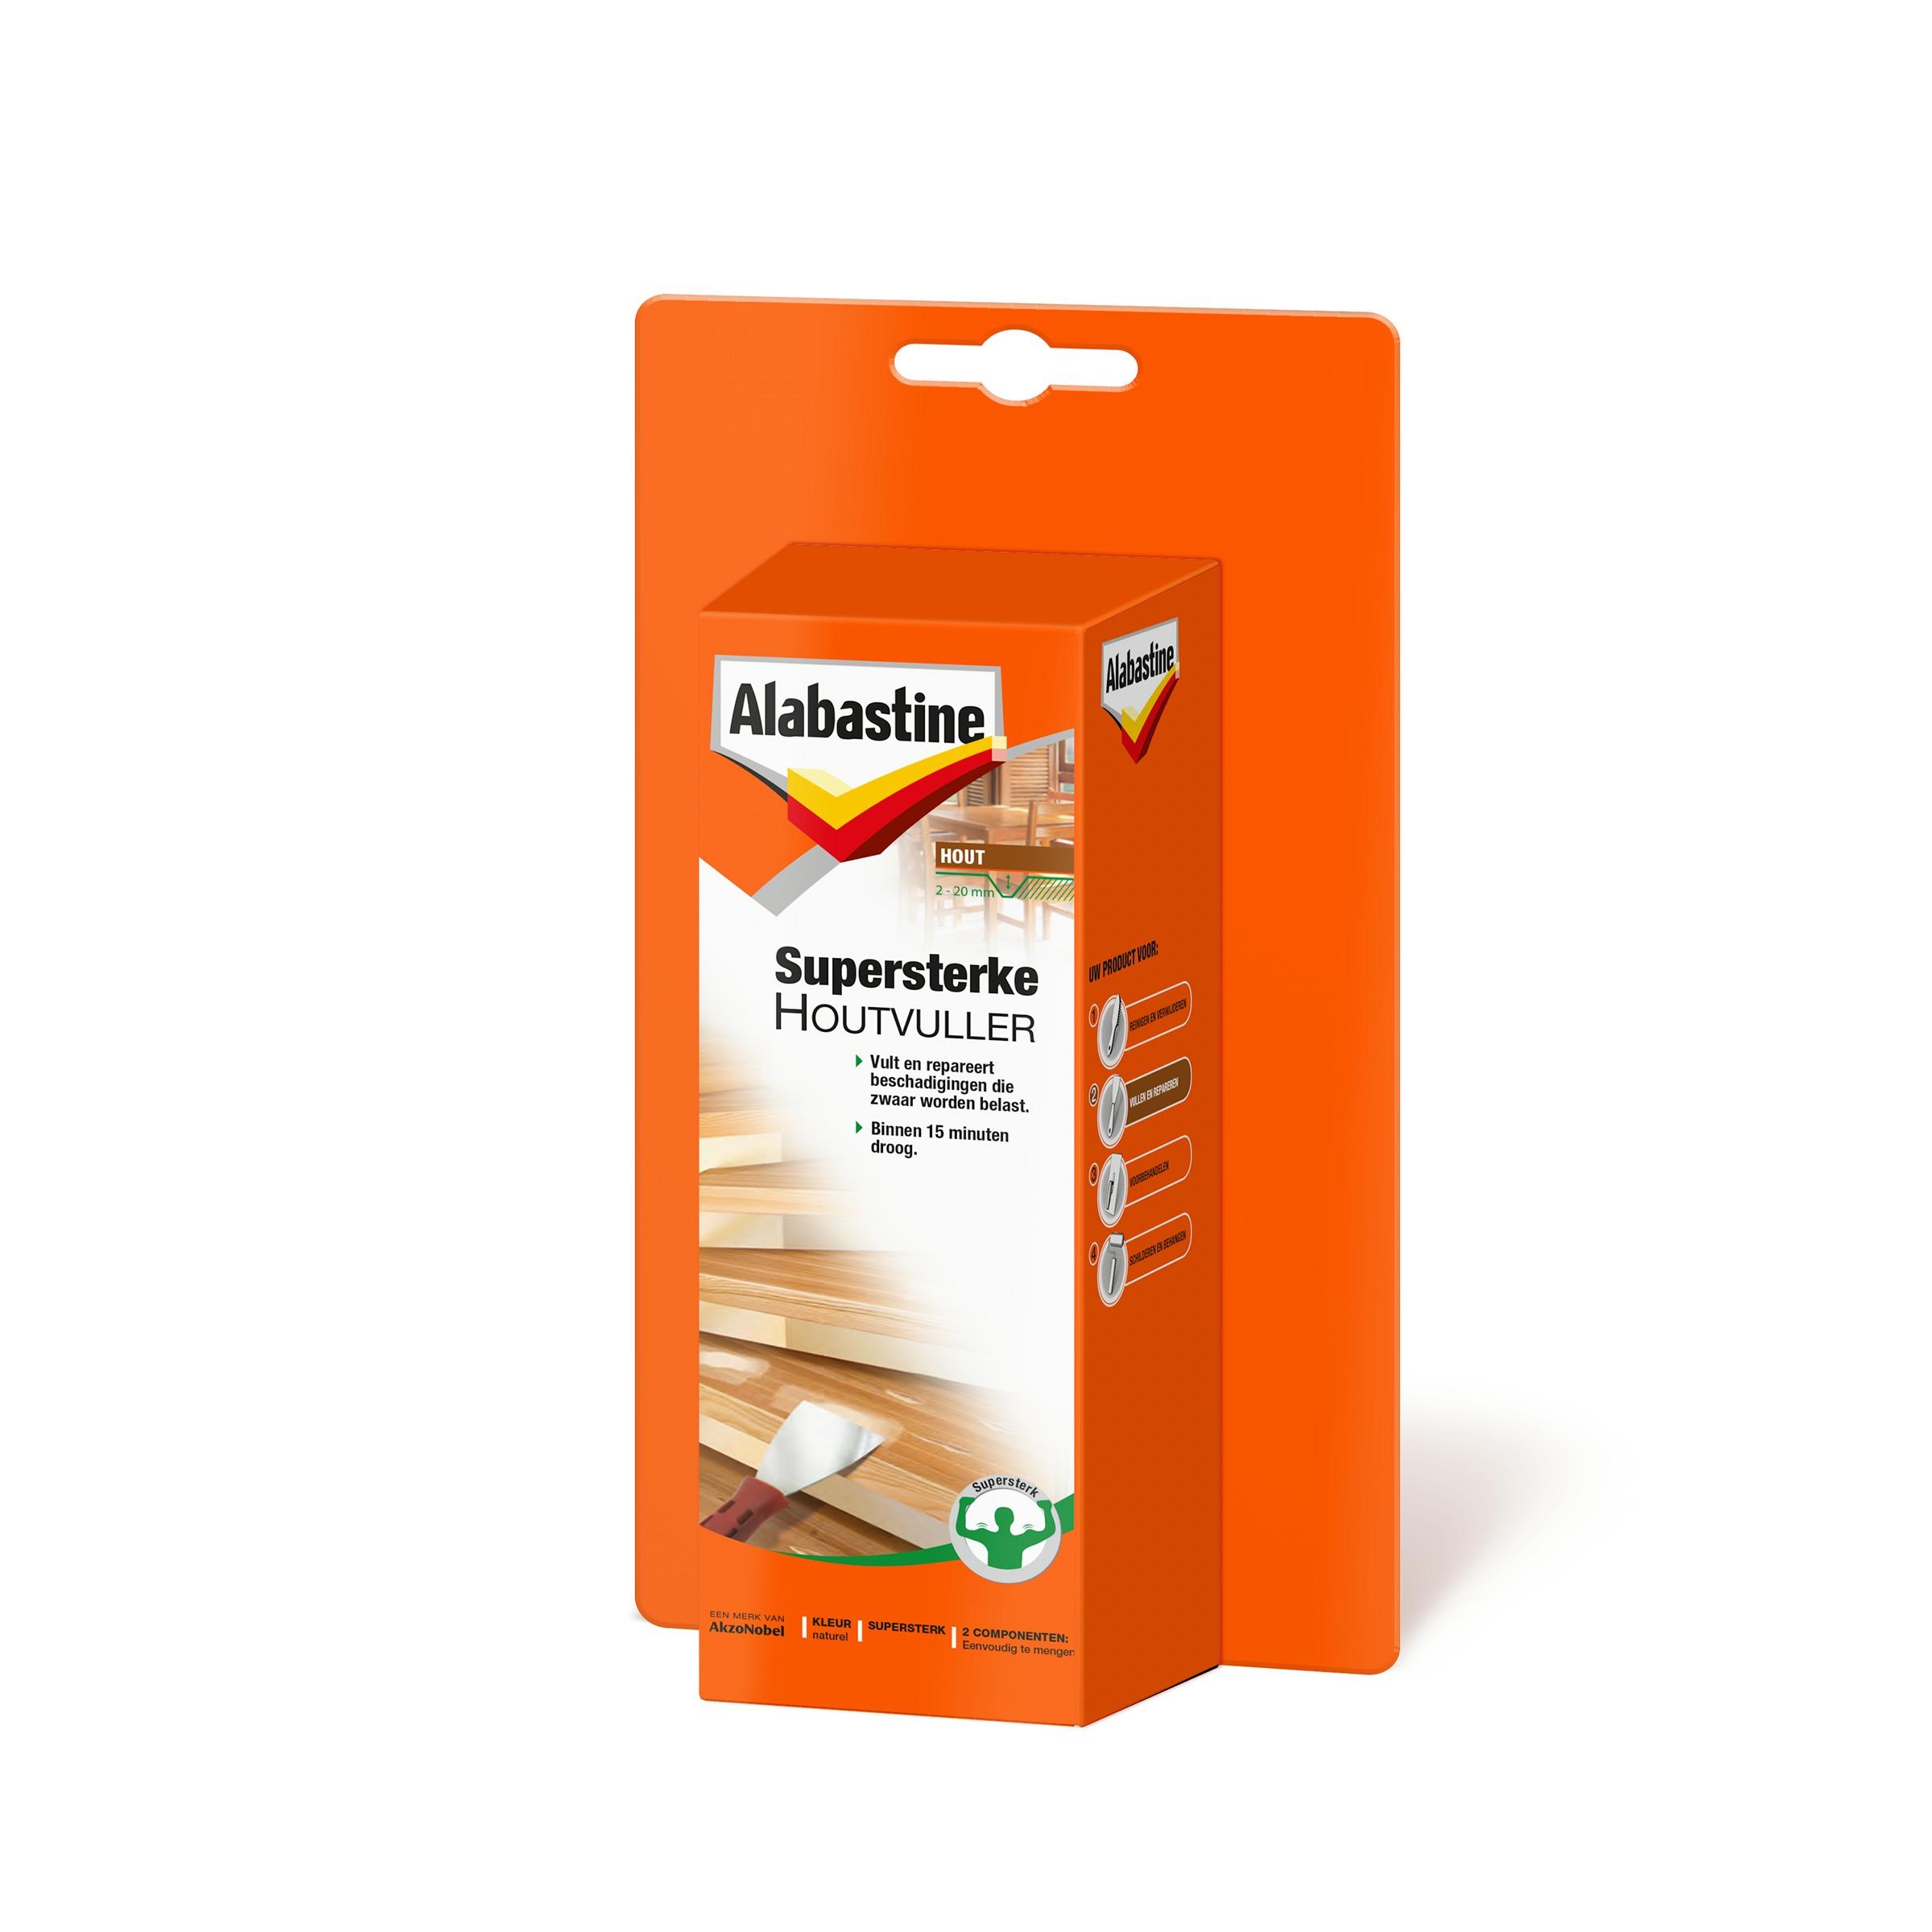 Alabastine supersterke plamuur wit 200 g